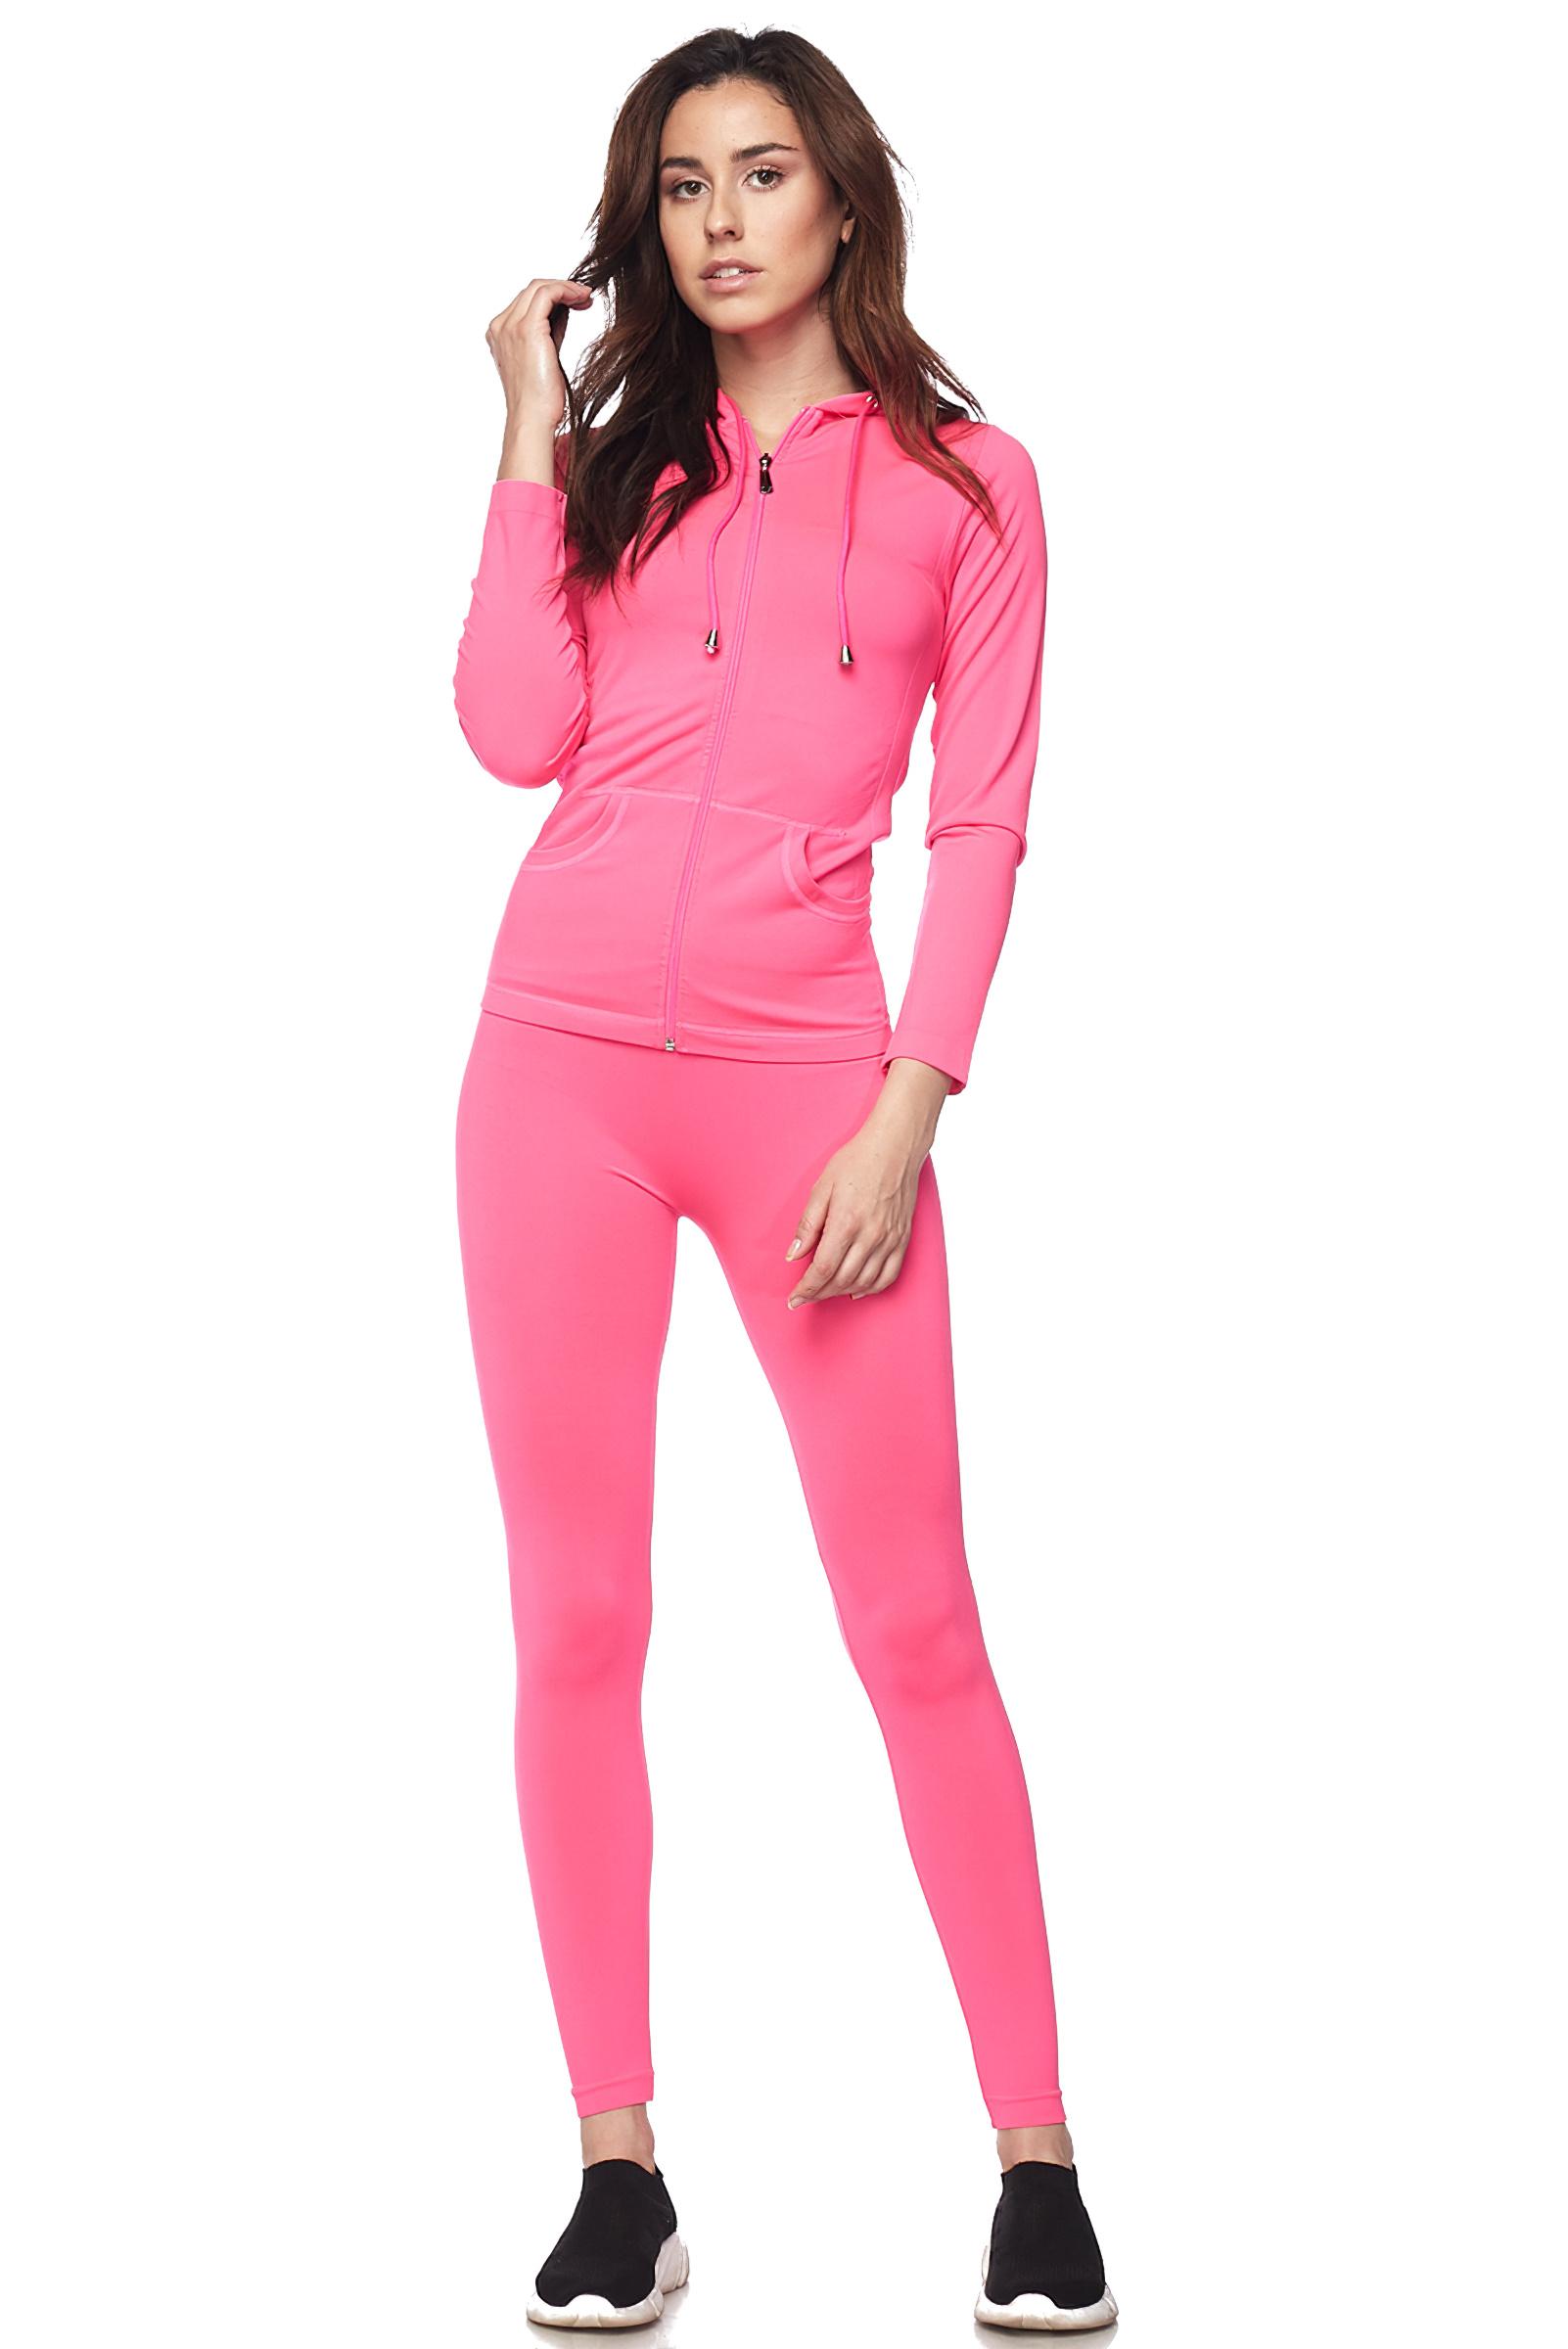 Women-039-s-Juniors-Active-Set-Wear-Zip-Up-Hoodie-and-Legging thumbnail 29